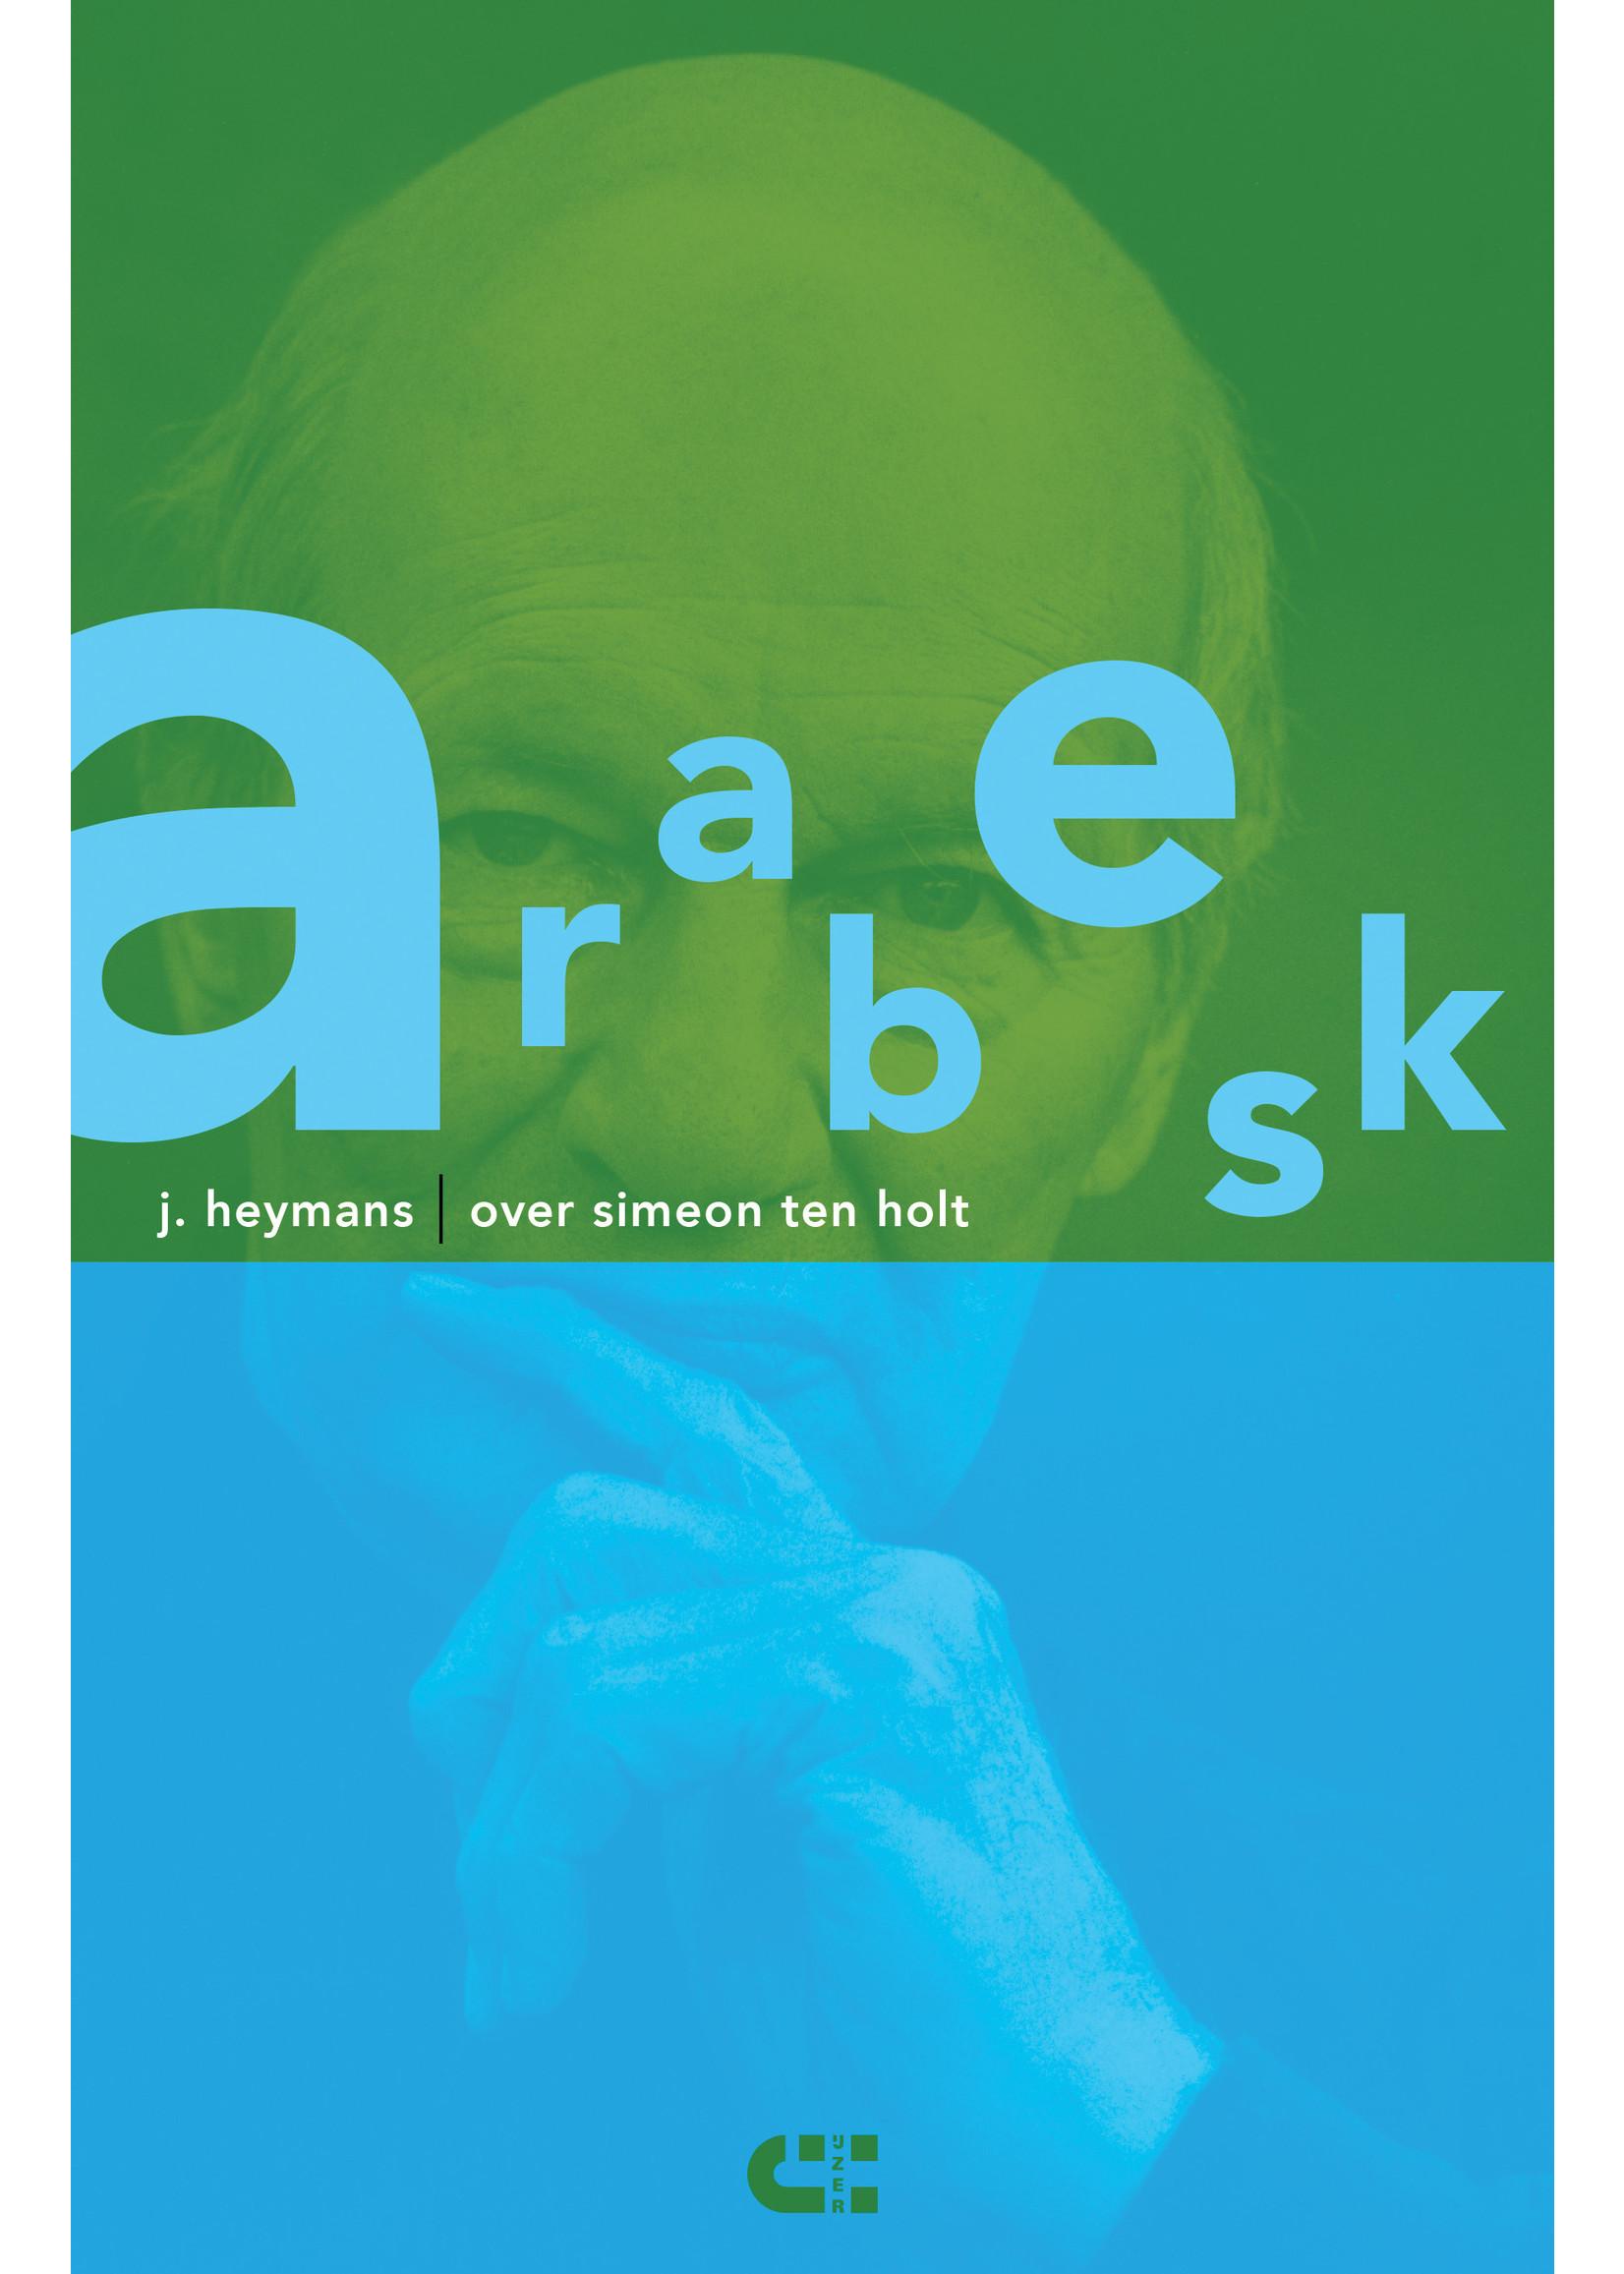 Arabesk über Simeon ten Holt - Heijmans + CD